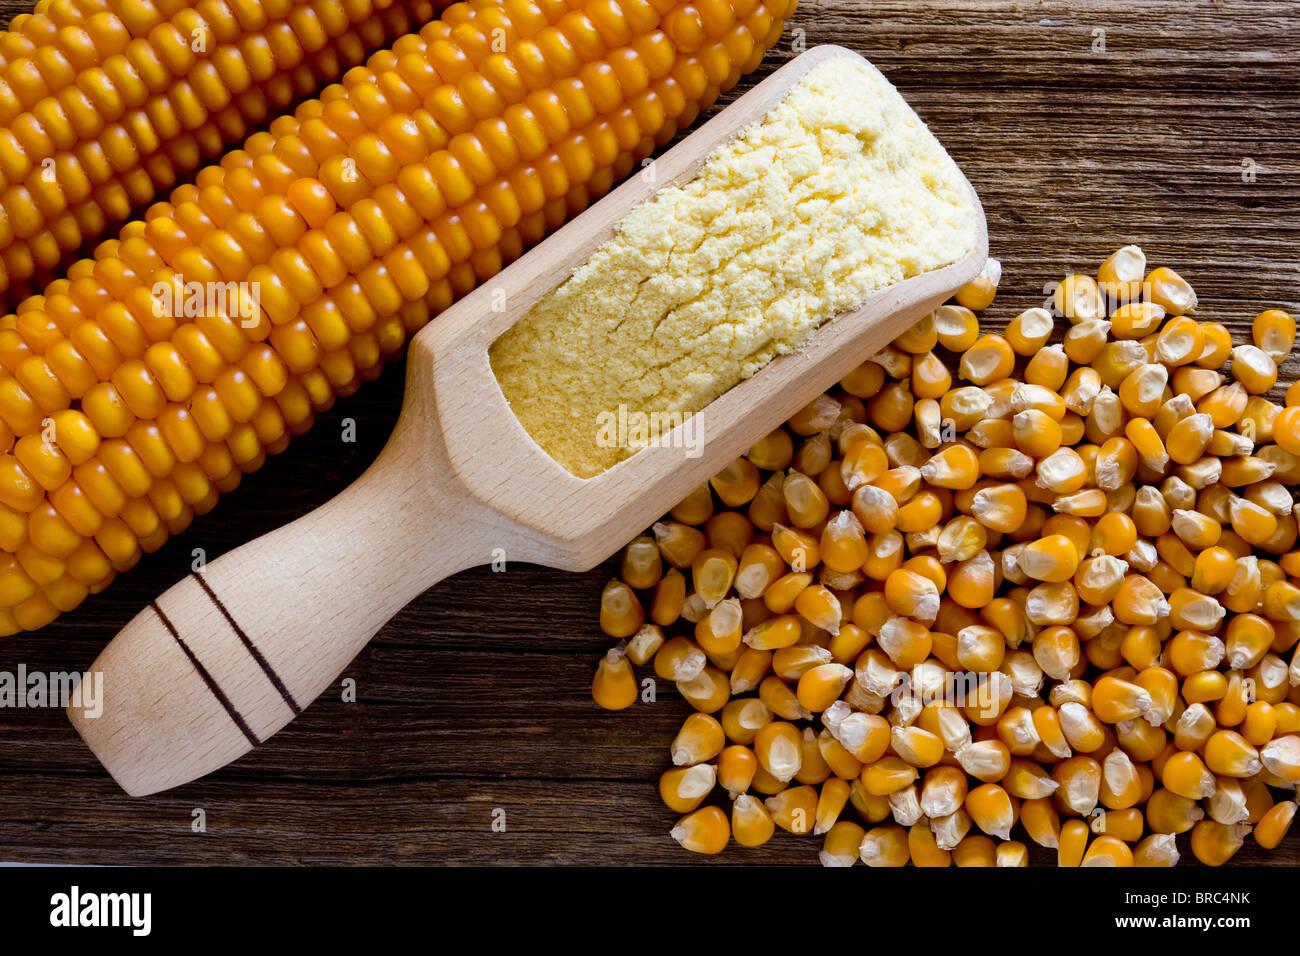 Corn on wooden desk - Stock Image